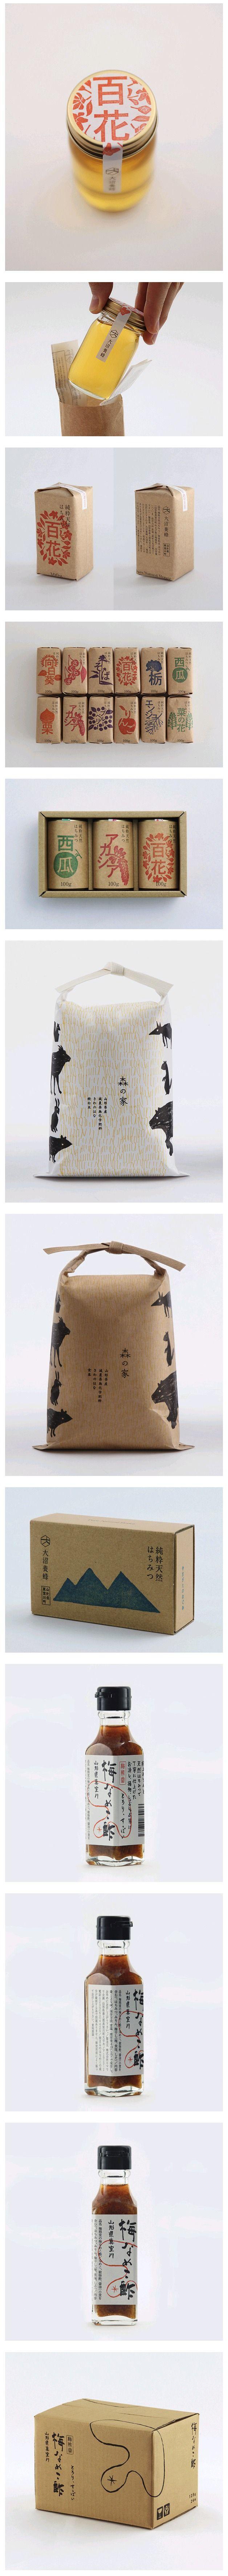 Japanese food packaging by Akaoni